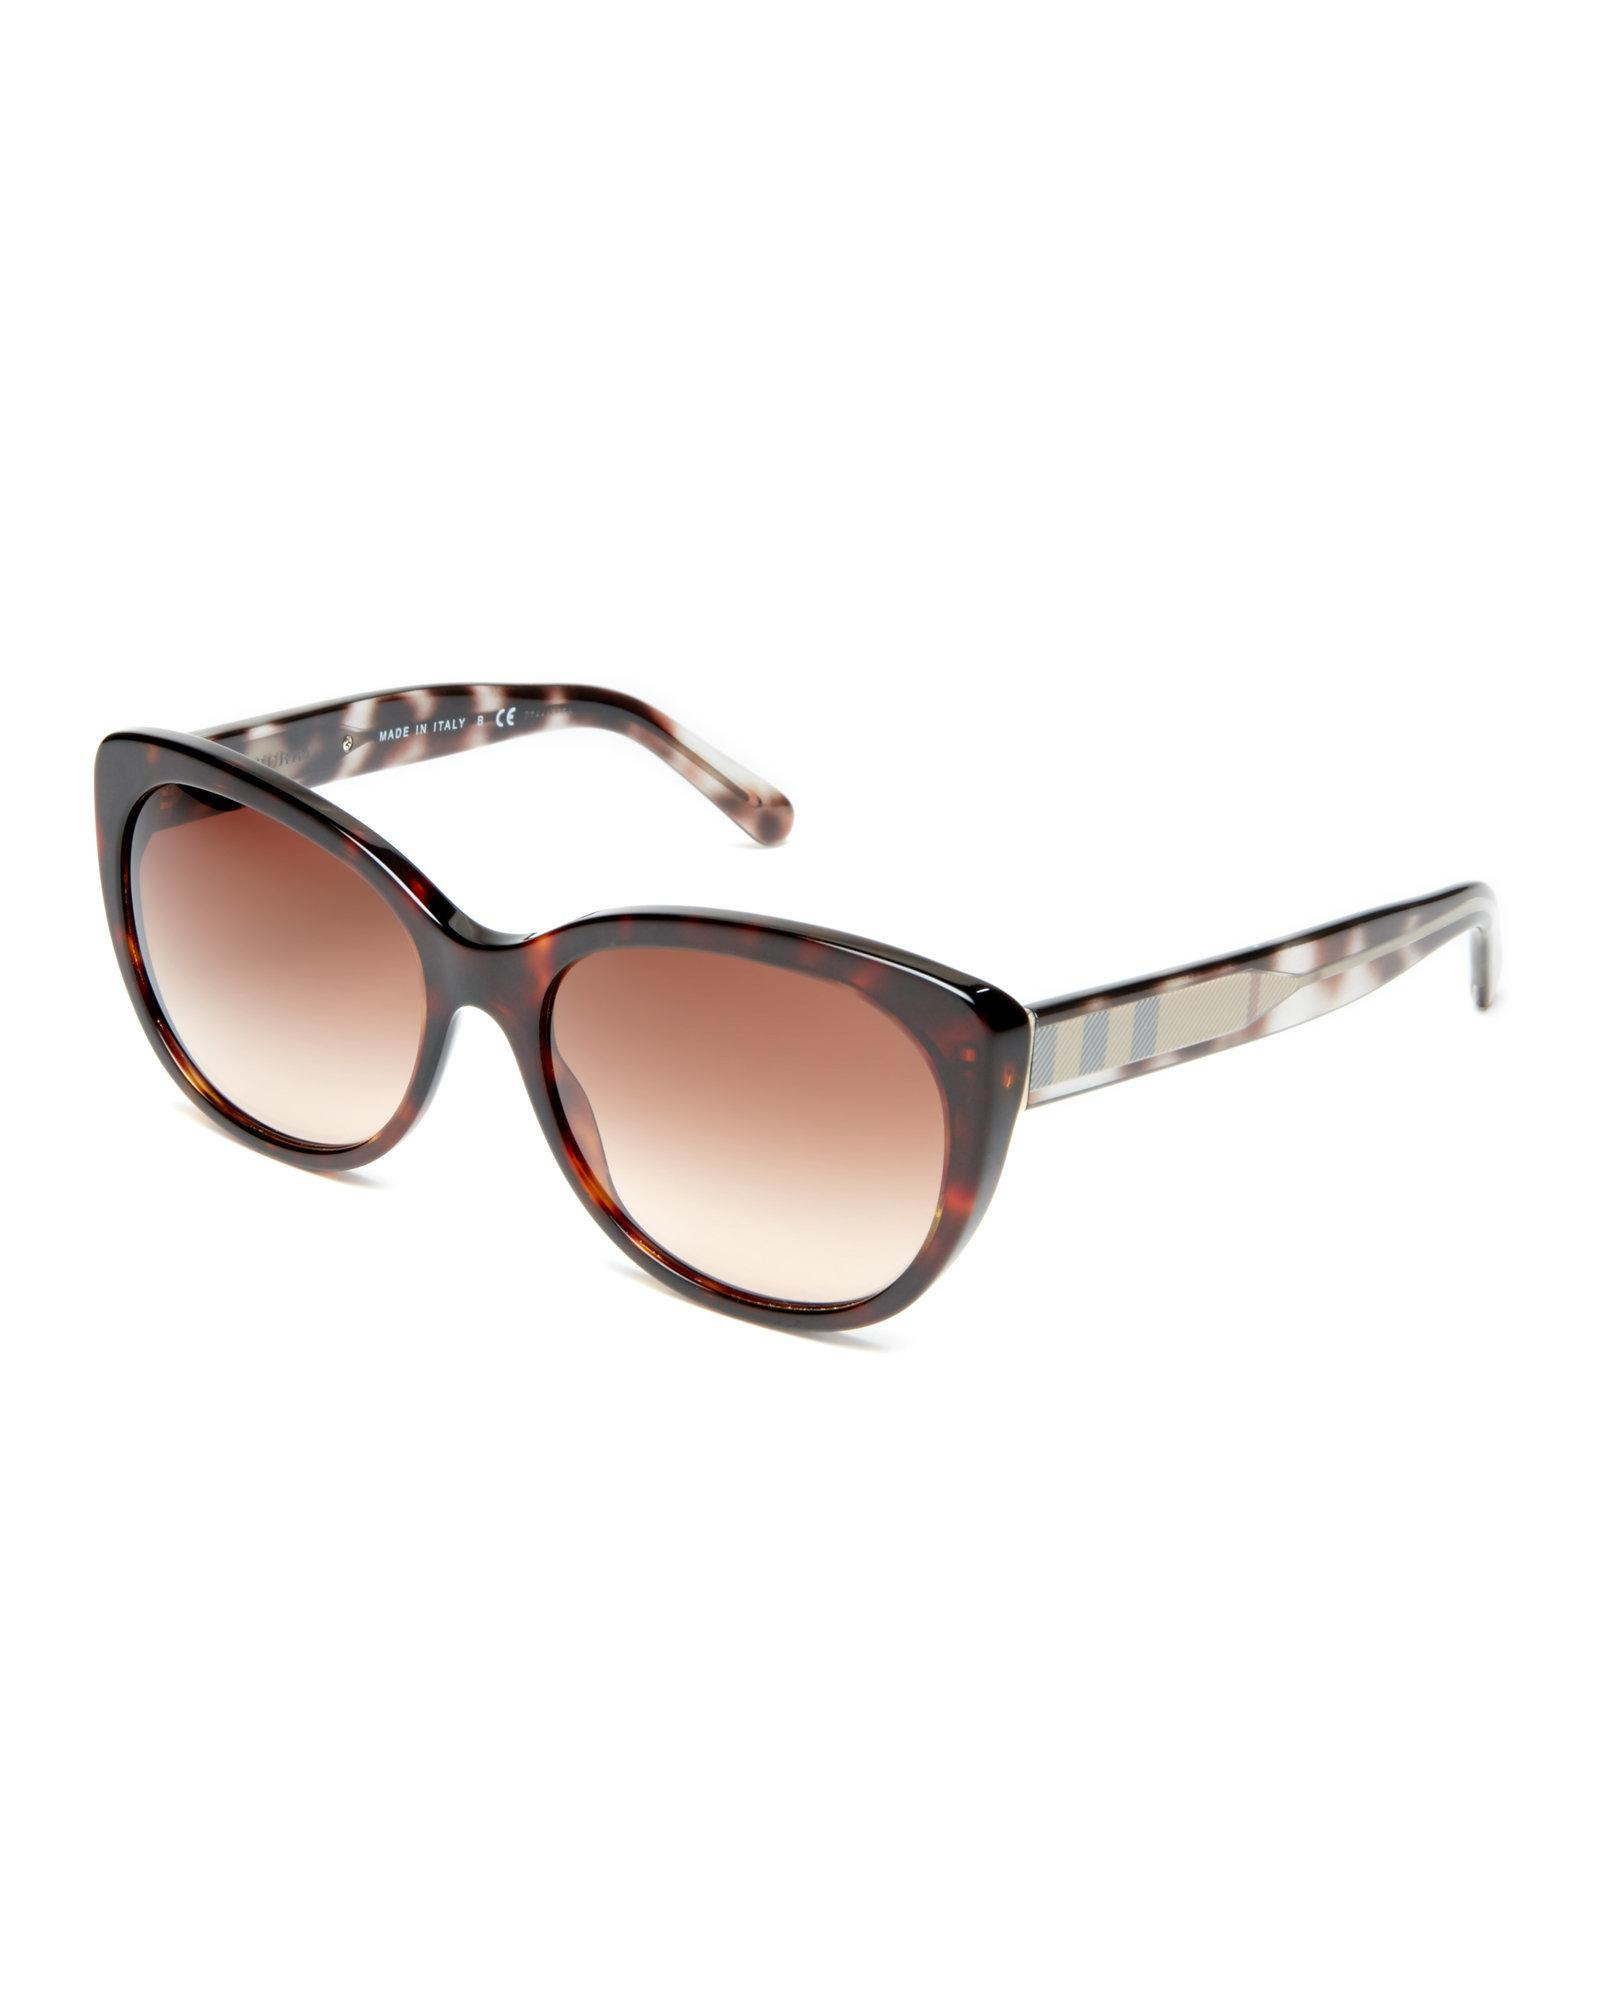 8ffa8150e828 Lyst - Burberry Be4224 Tortoiseshell-Look Cat Eye Sunglasses in Brown